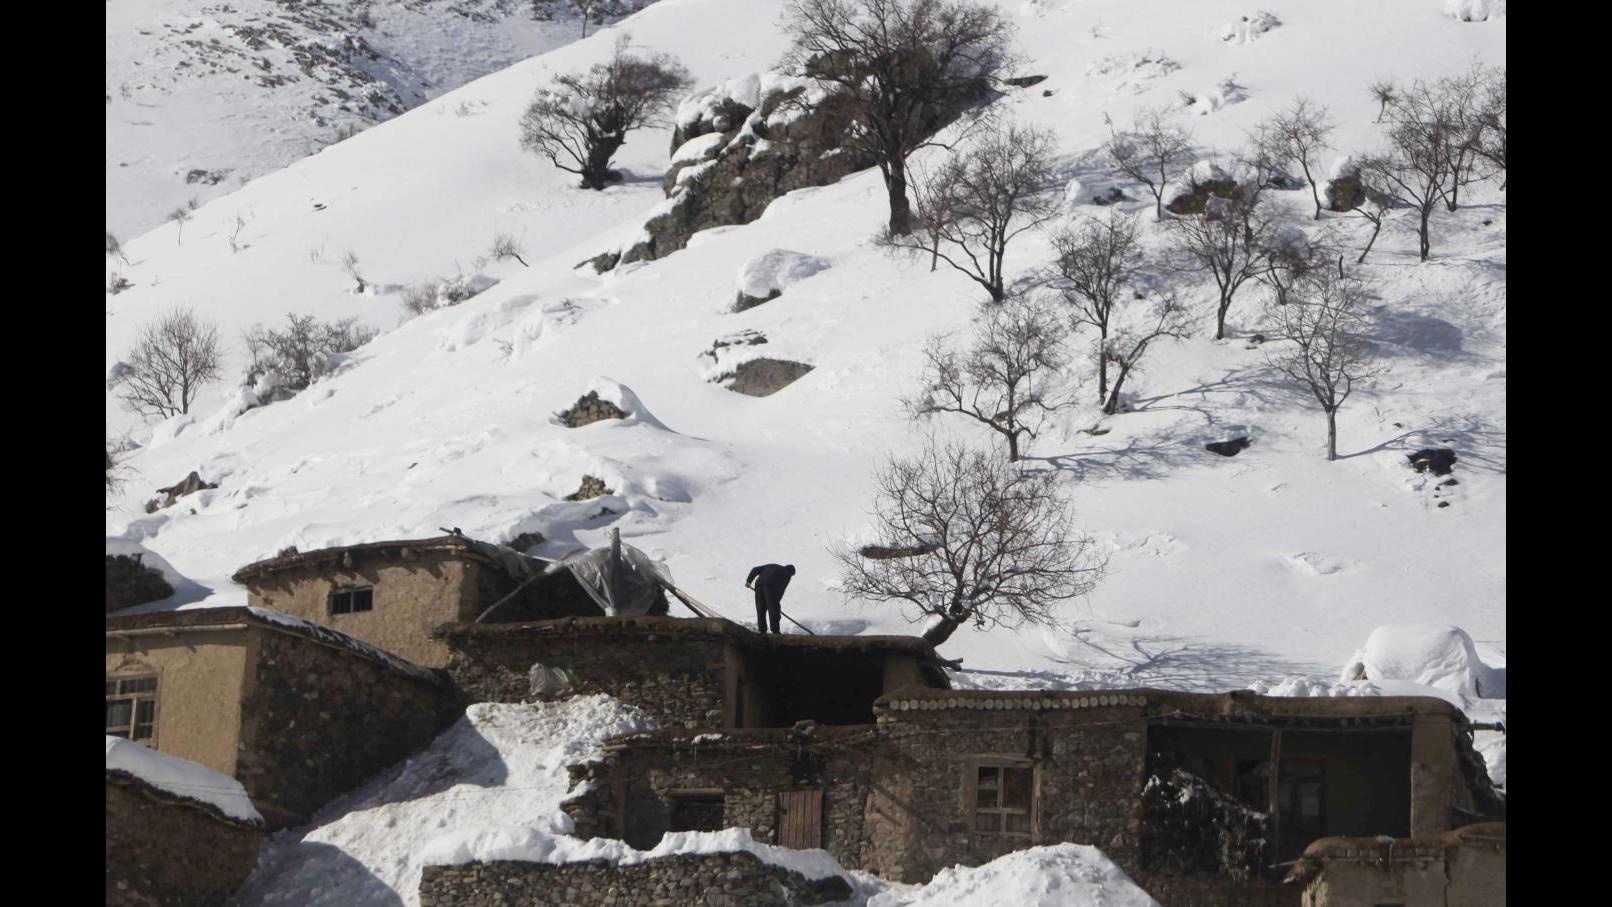 Afghanistan, valanga travolge villaggio: 37 morti accertati